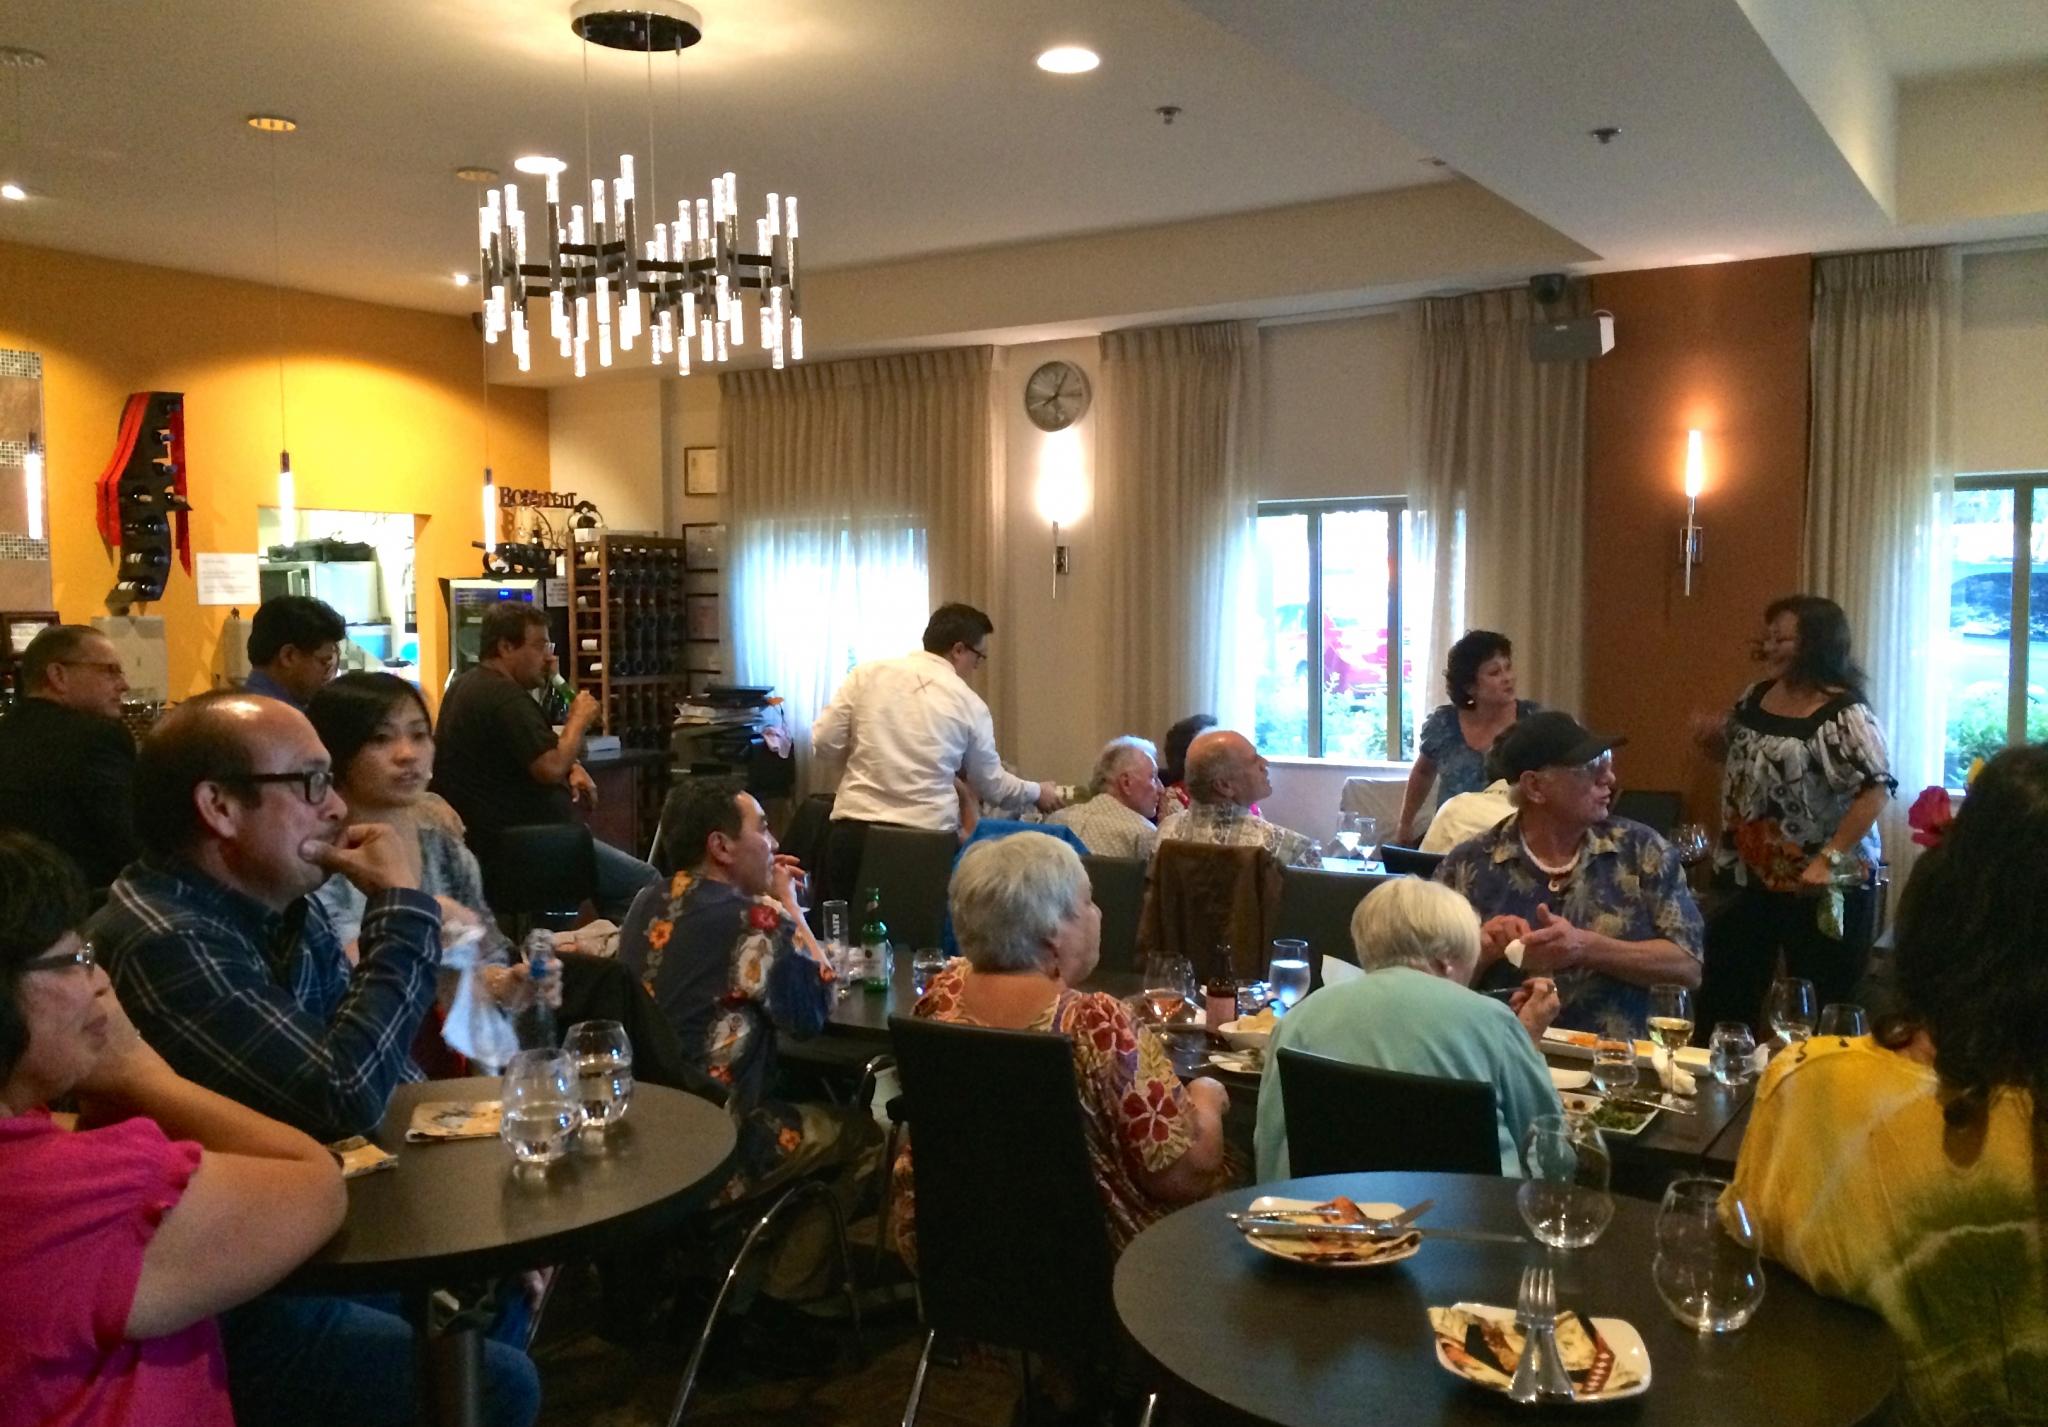 6 Bay Area hot spots for Hawaiian-style eats - SFGate